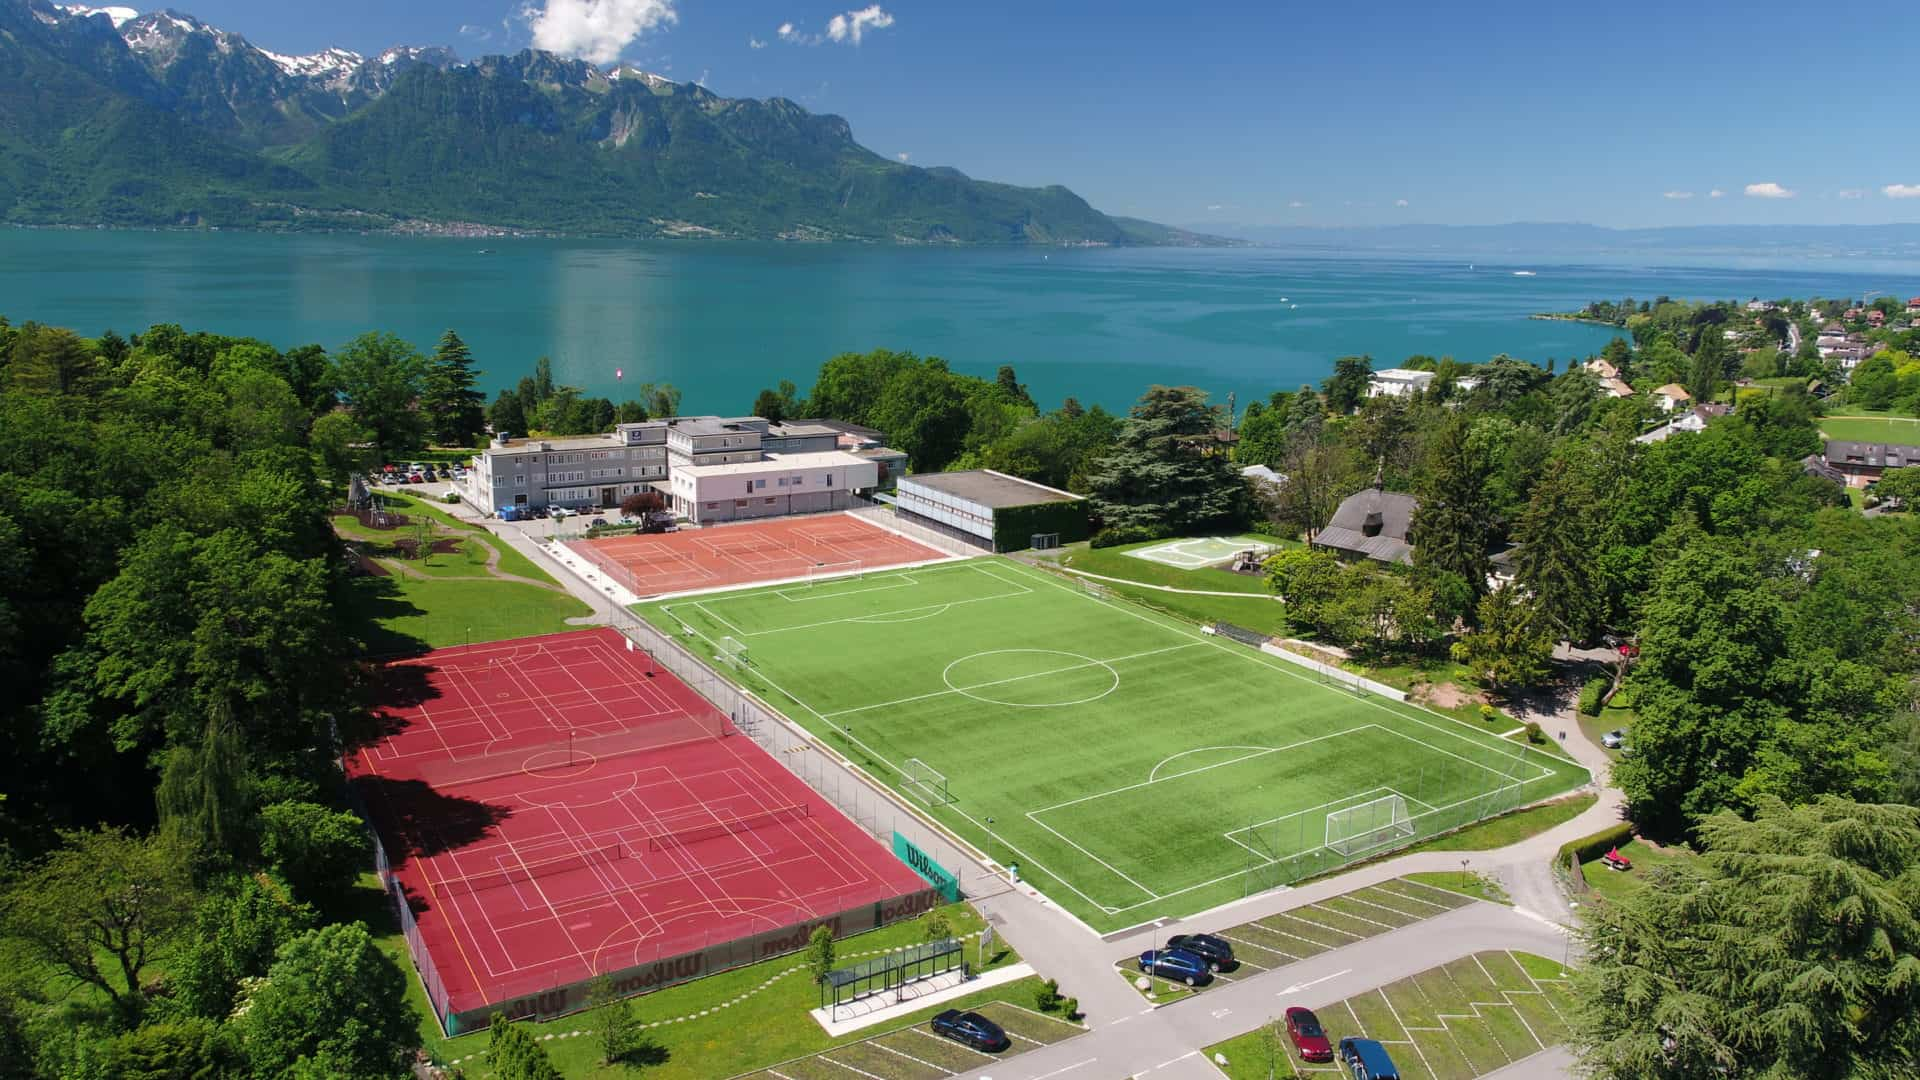 St George's international school in Montreux